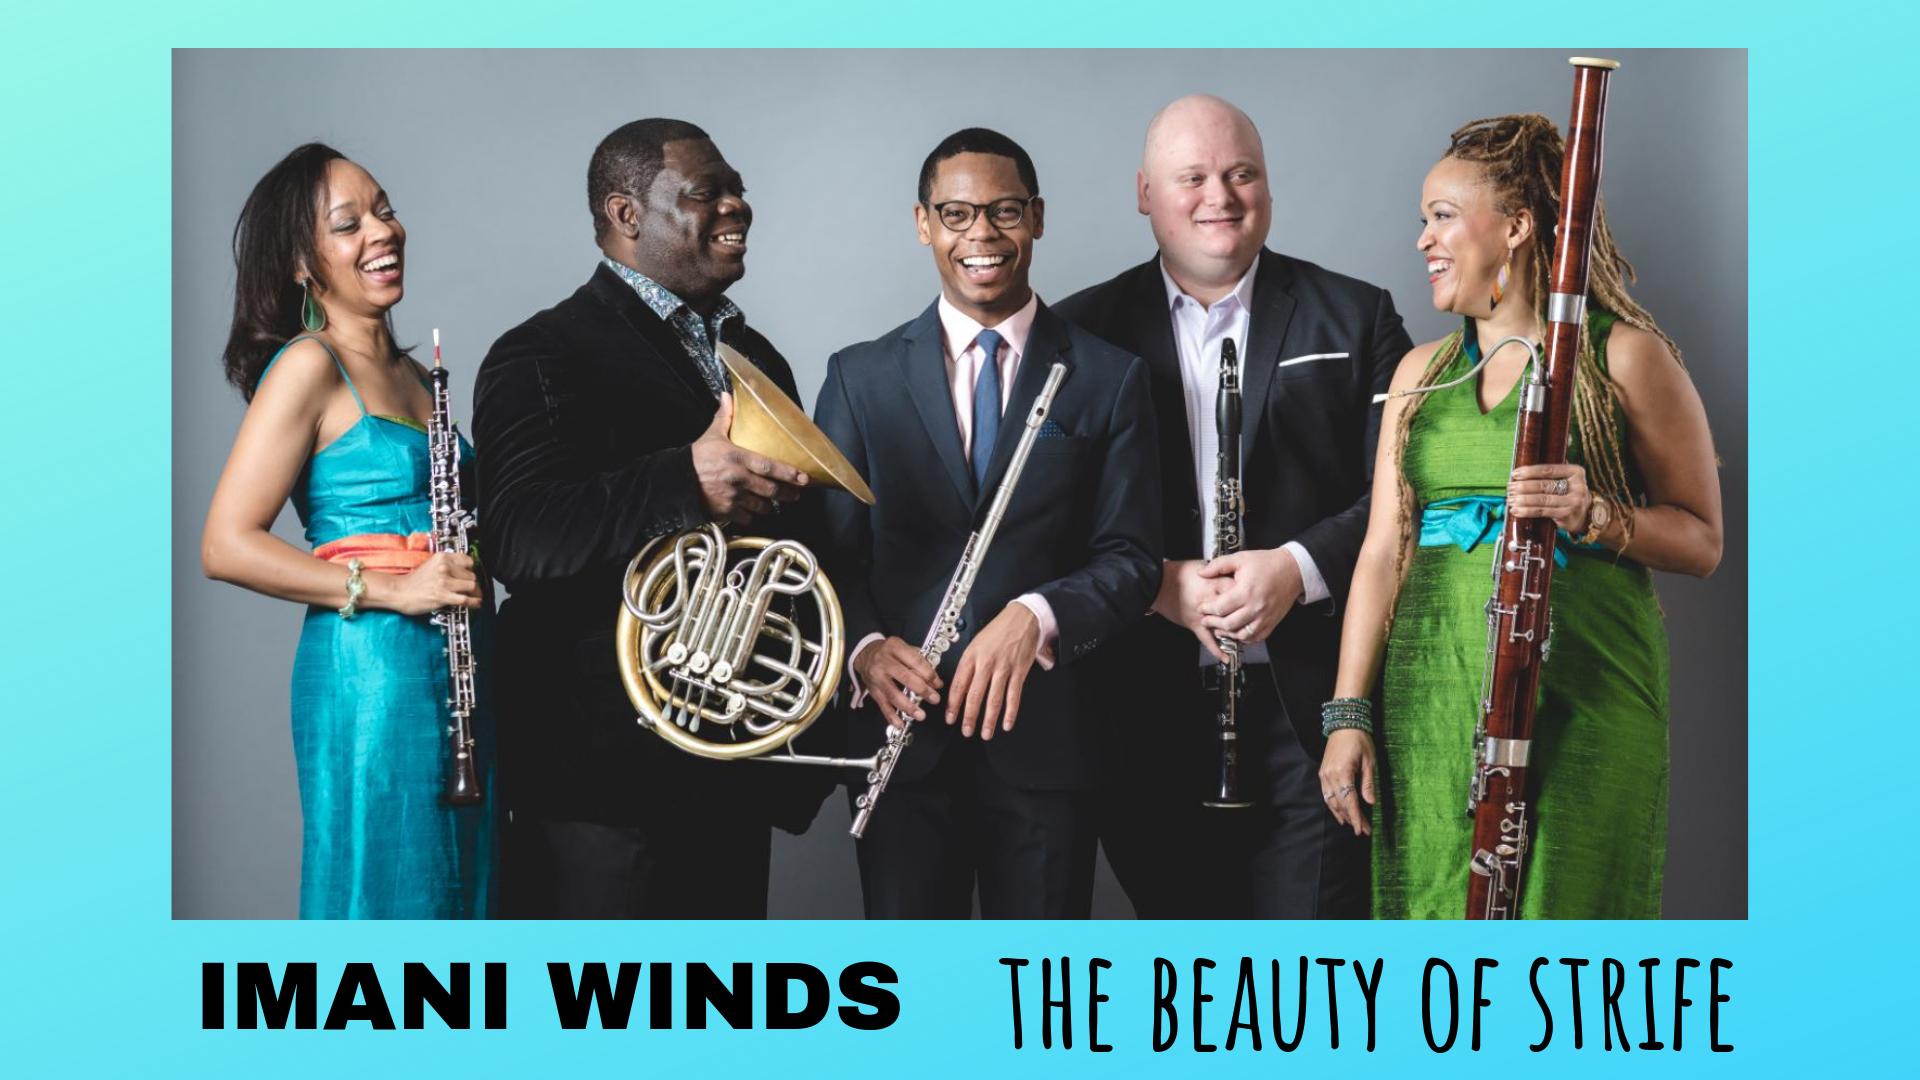 Imani Winds: The Beauty of Strife – Vesper Concerts